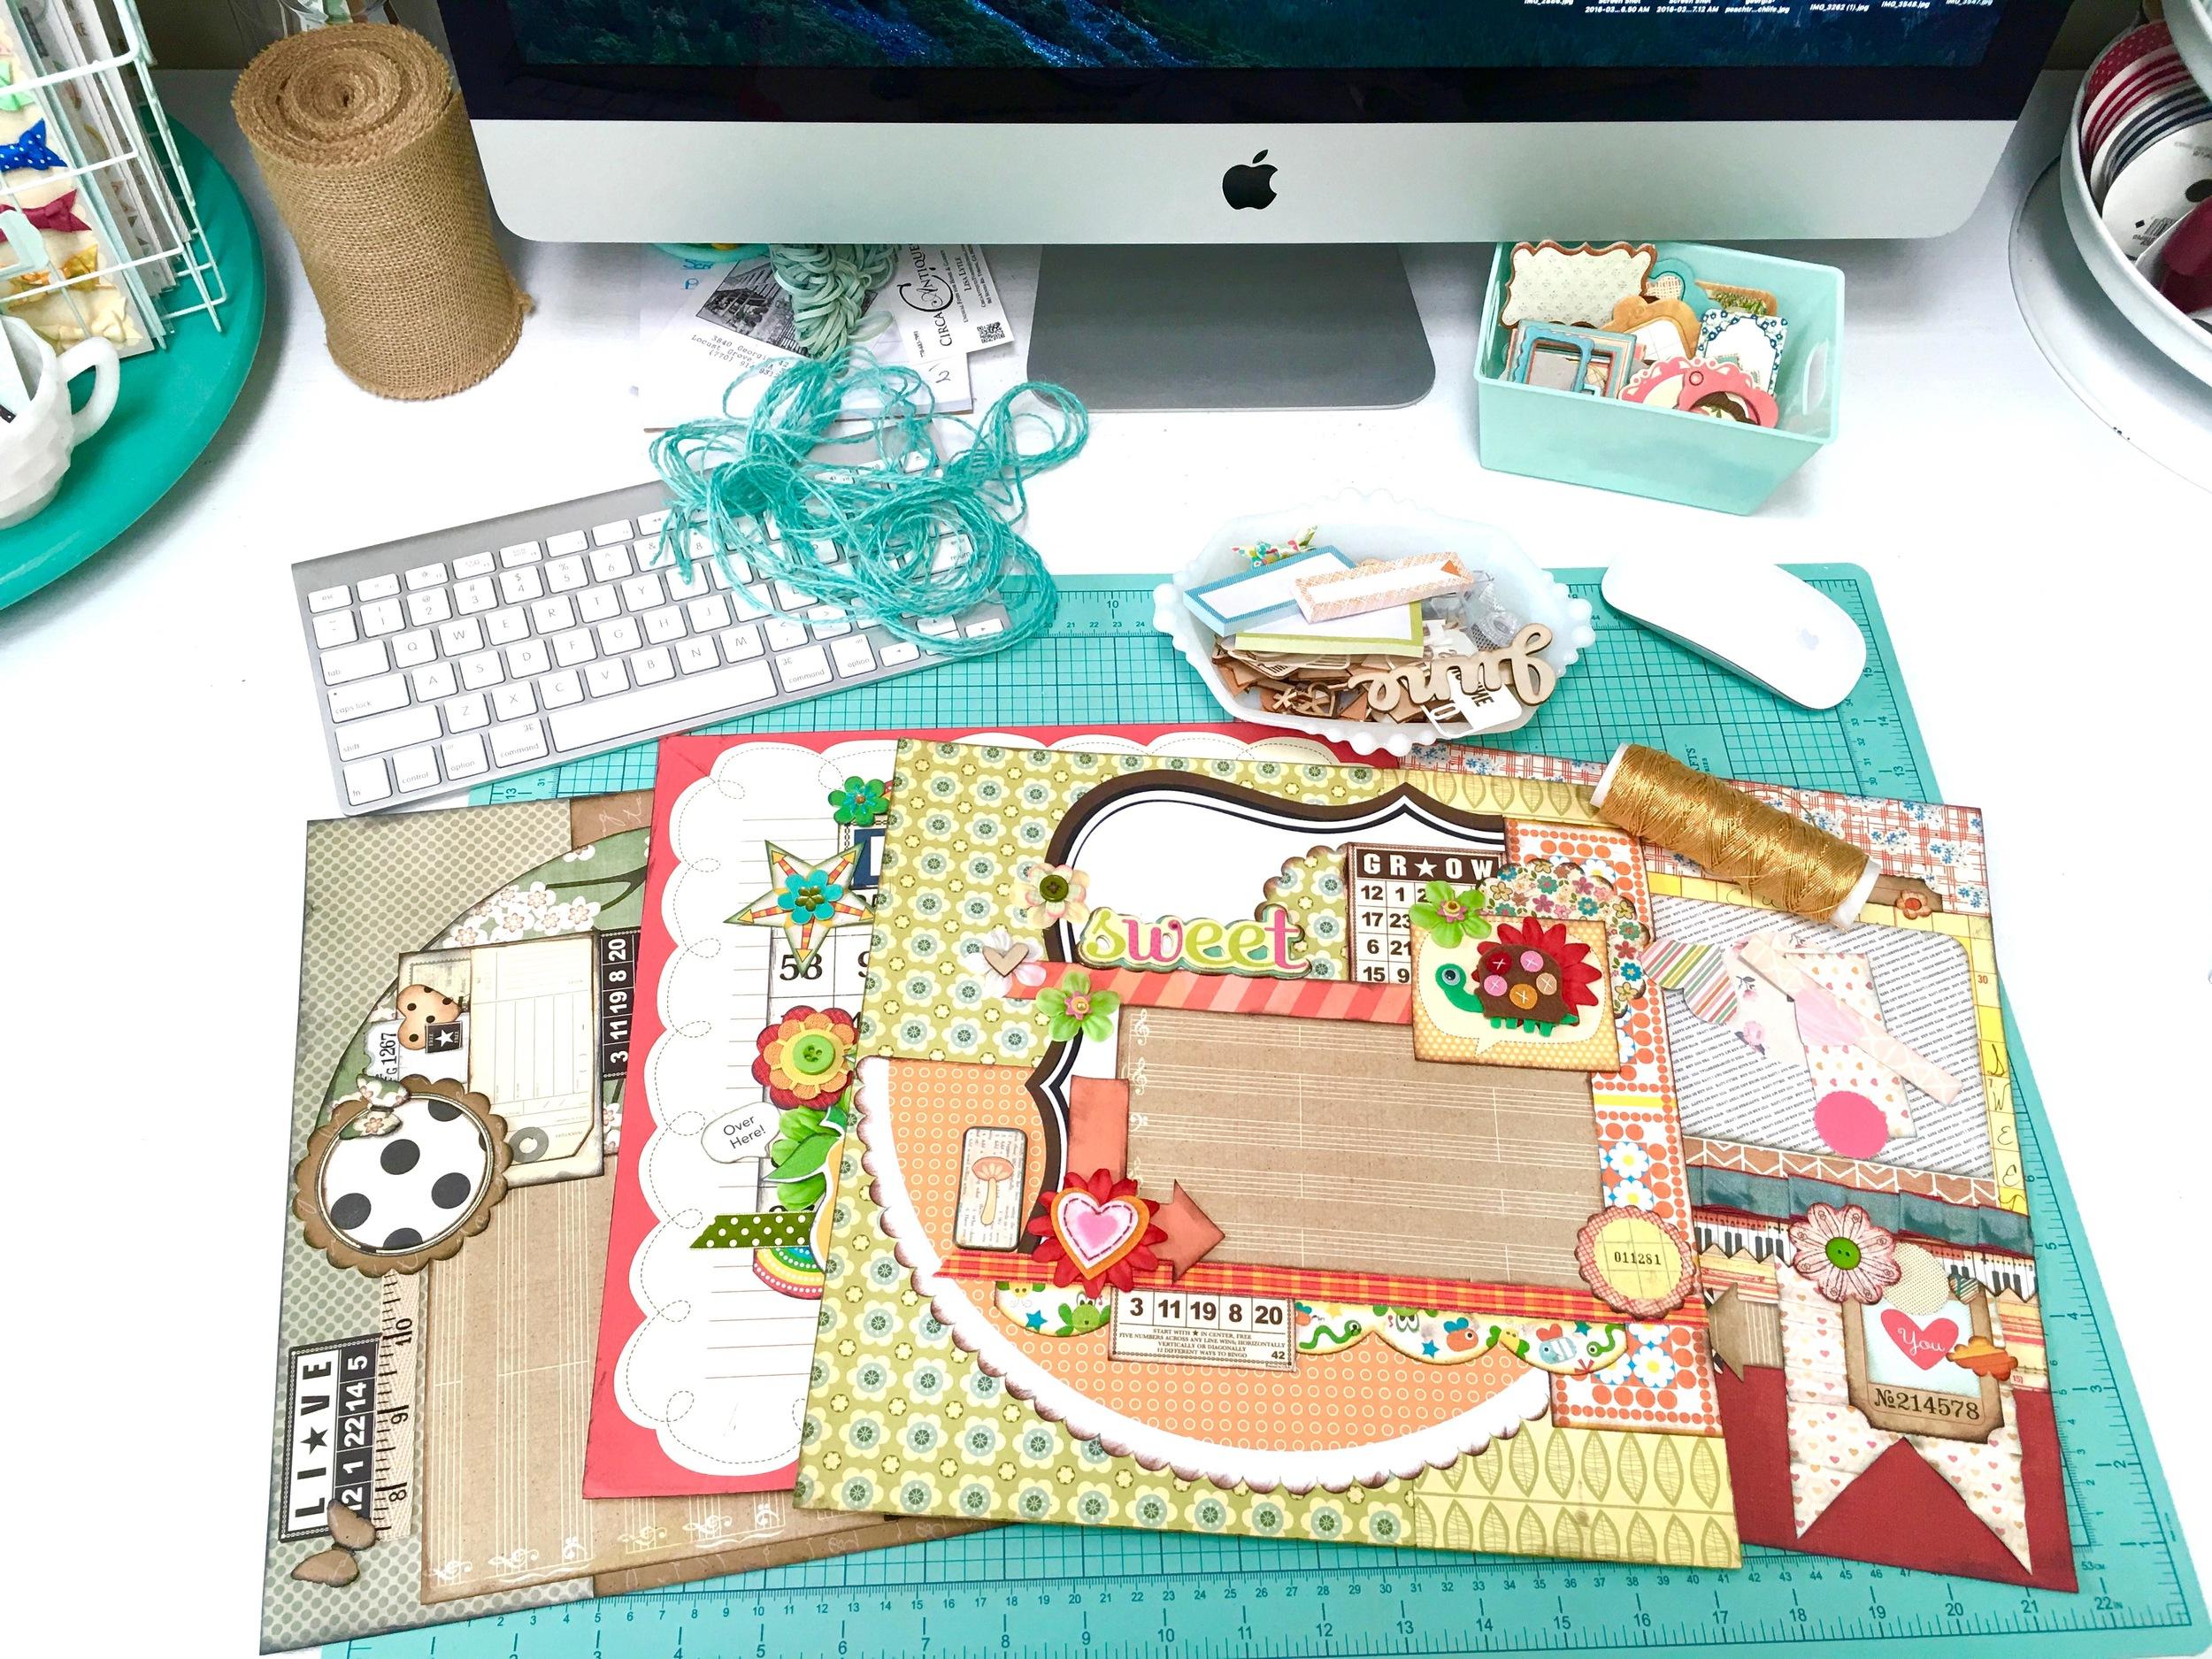 scrapbooking-scrapbook-desk-scrapbook-pages-a-peach-life